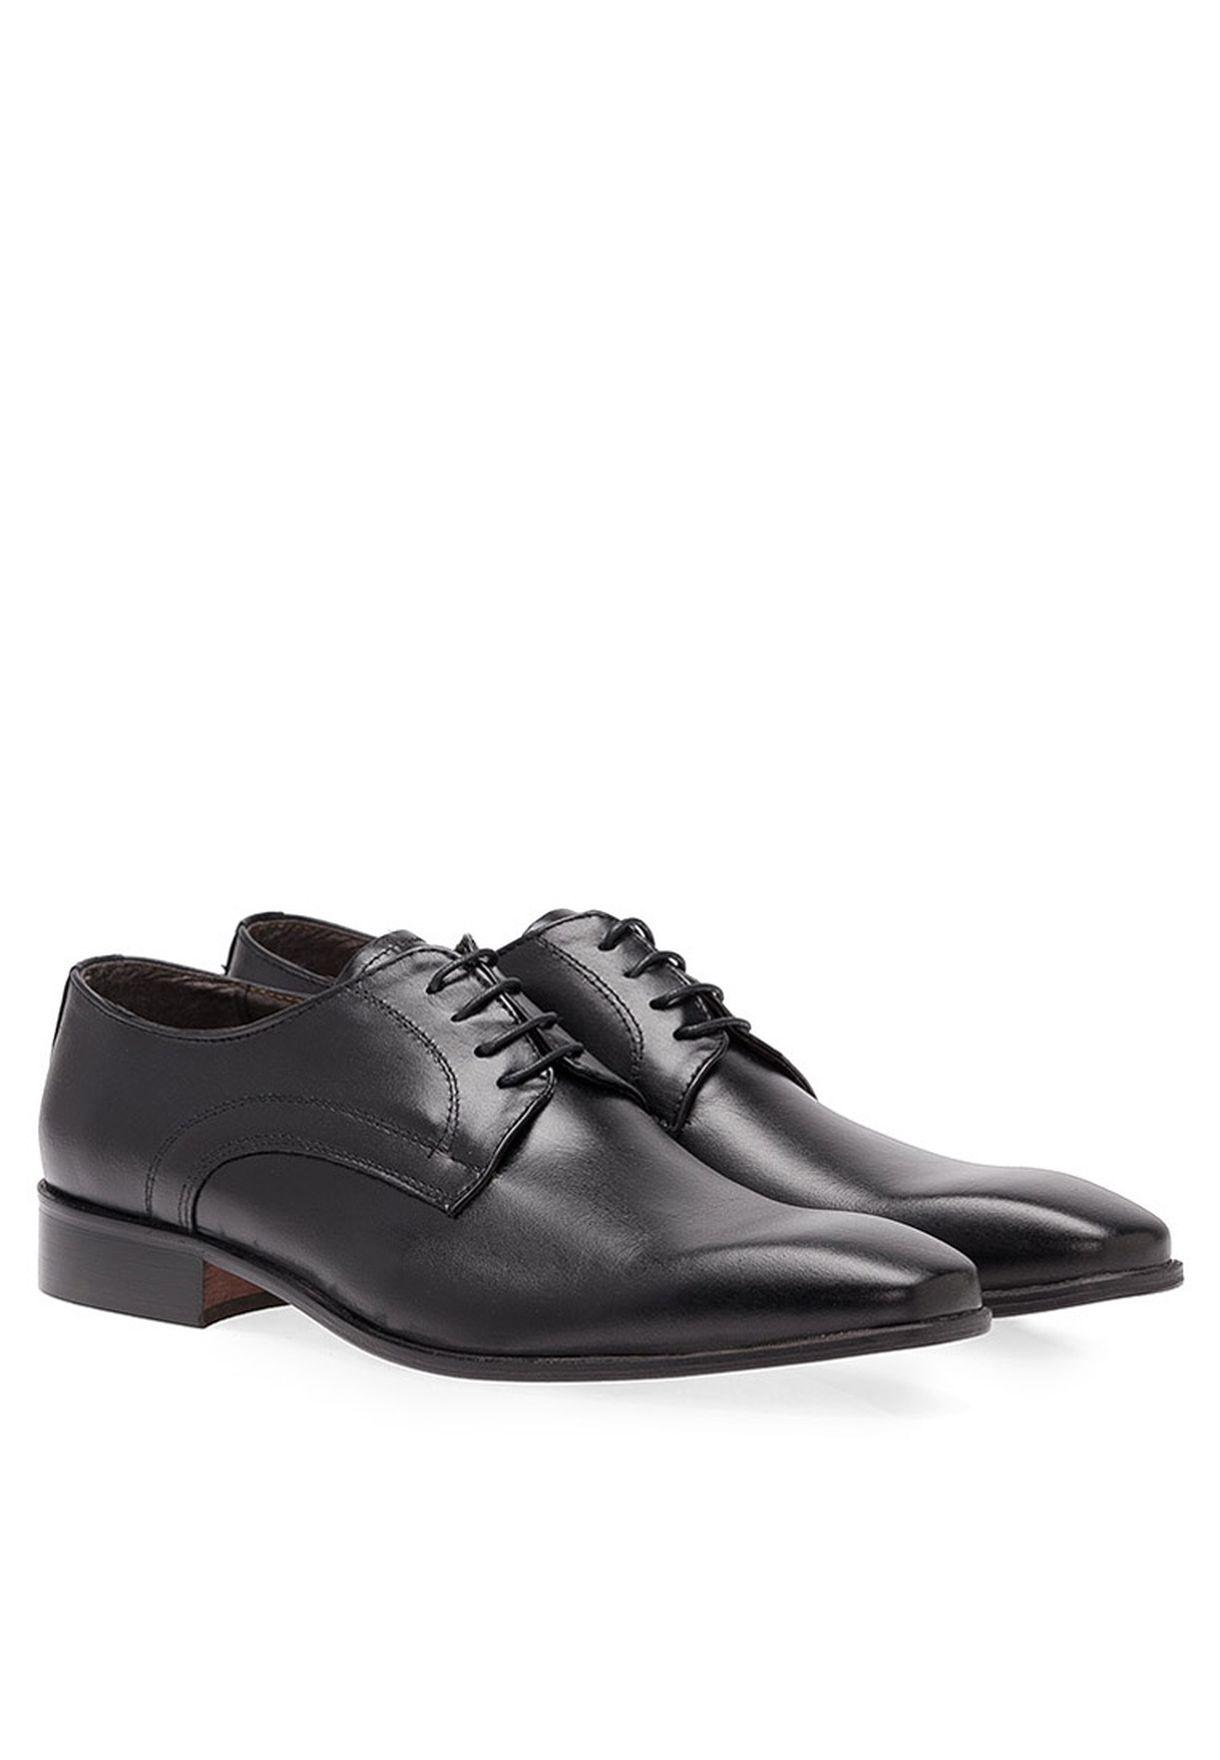 b4c734f76 Shop Gianni Russo black Formal Lace Ups for Men in Qatar - GI004SH43ZAE